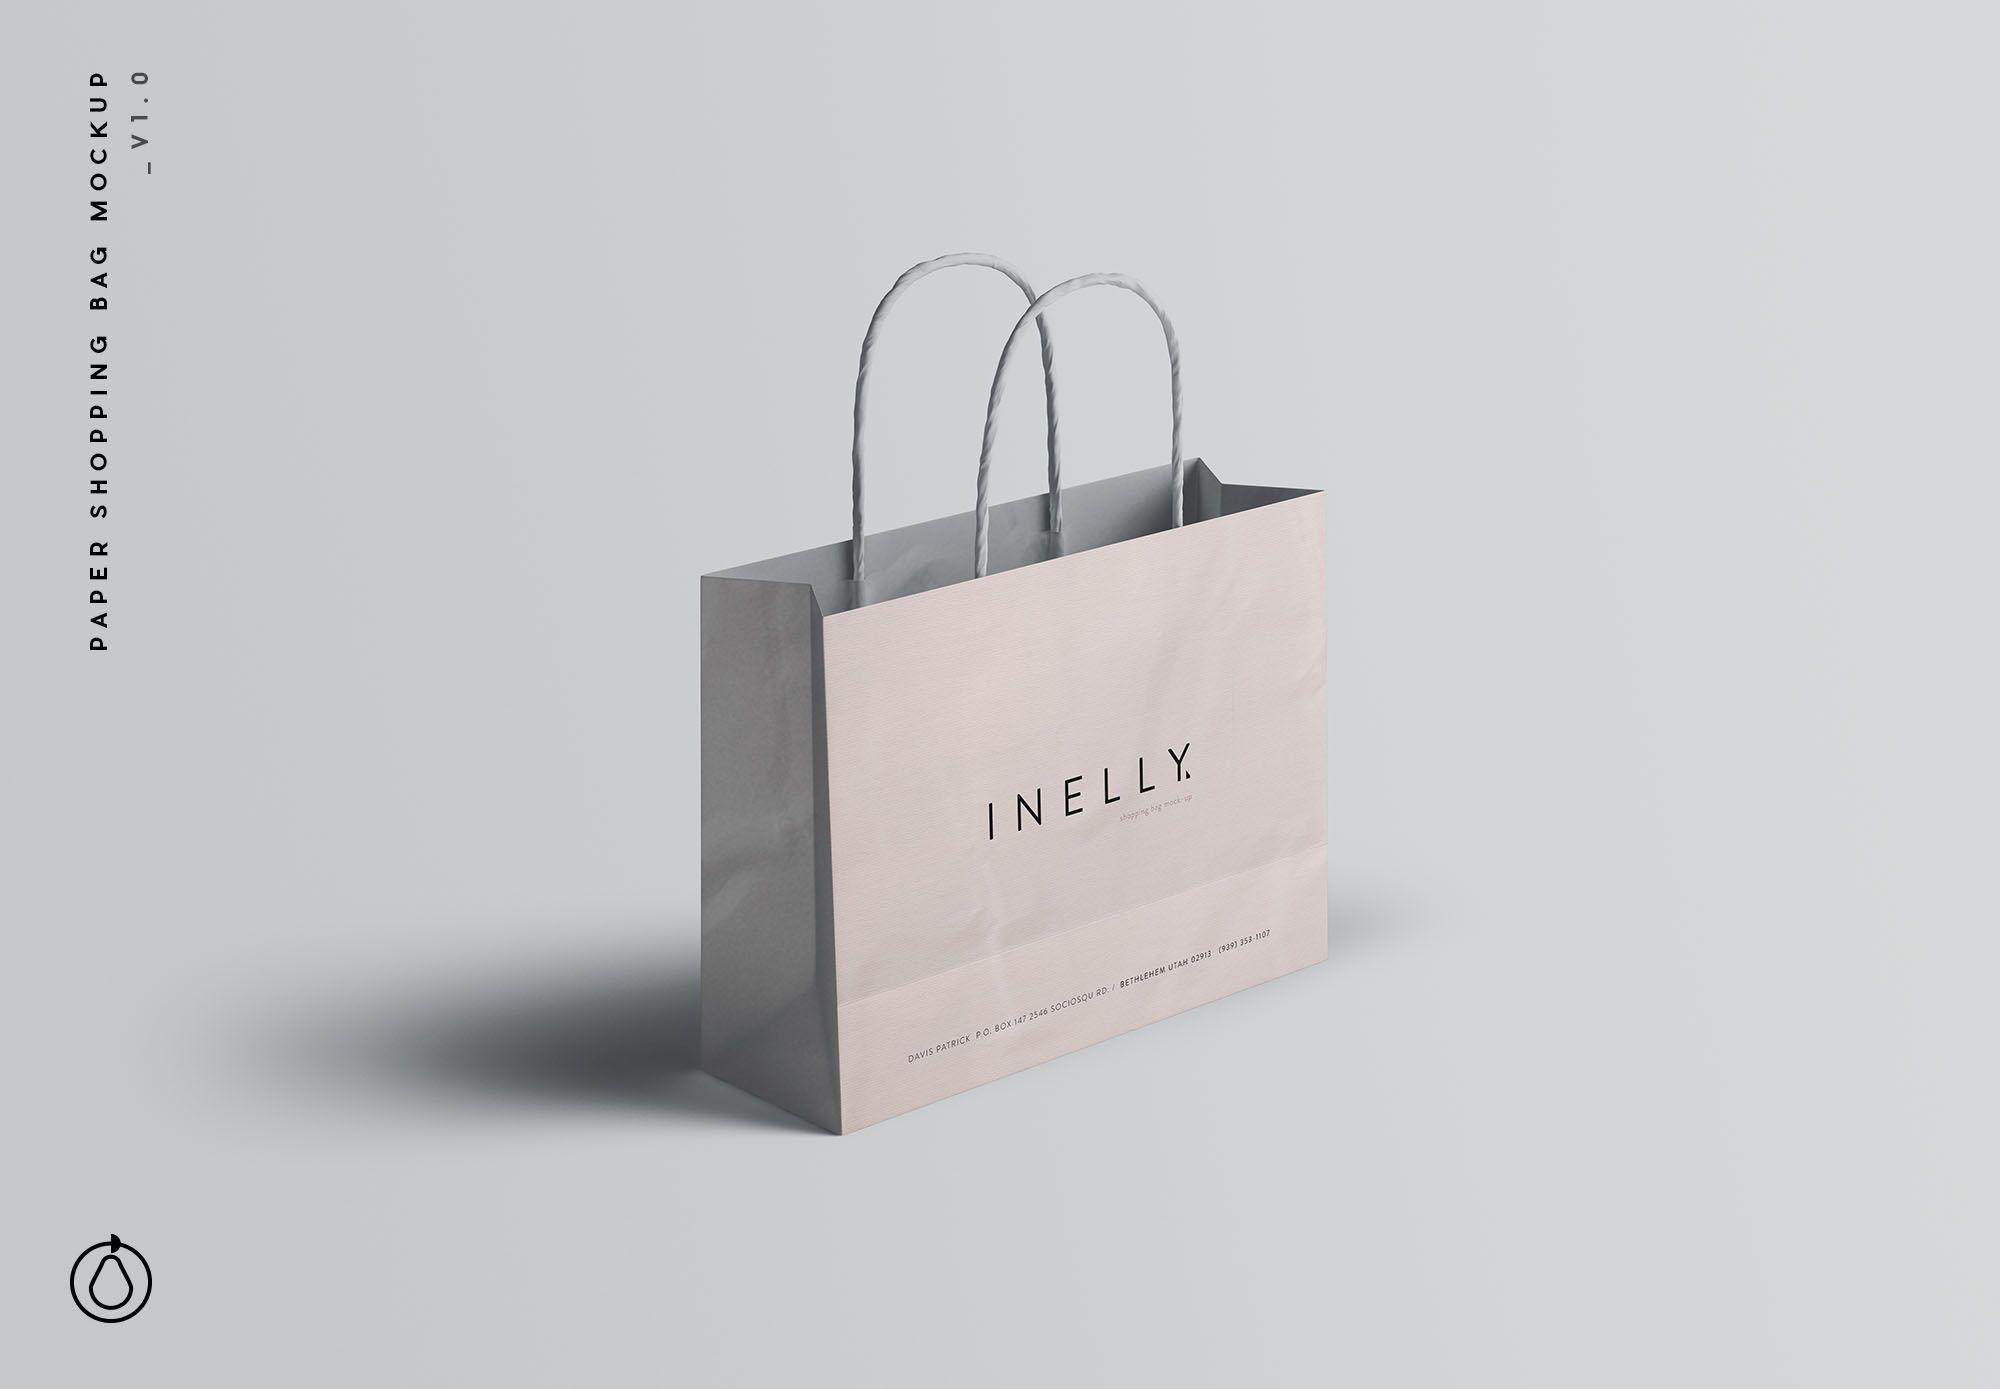 Download Paper Shopping Bag Mockup Psd Bag Mockup Paper Shopping Bag Mockup Psd